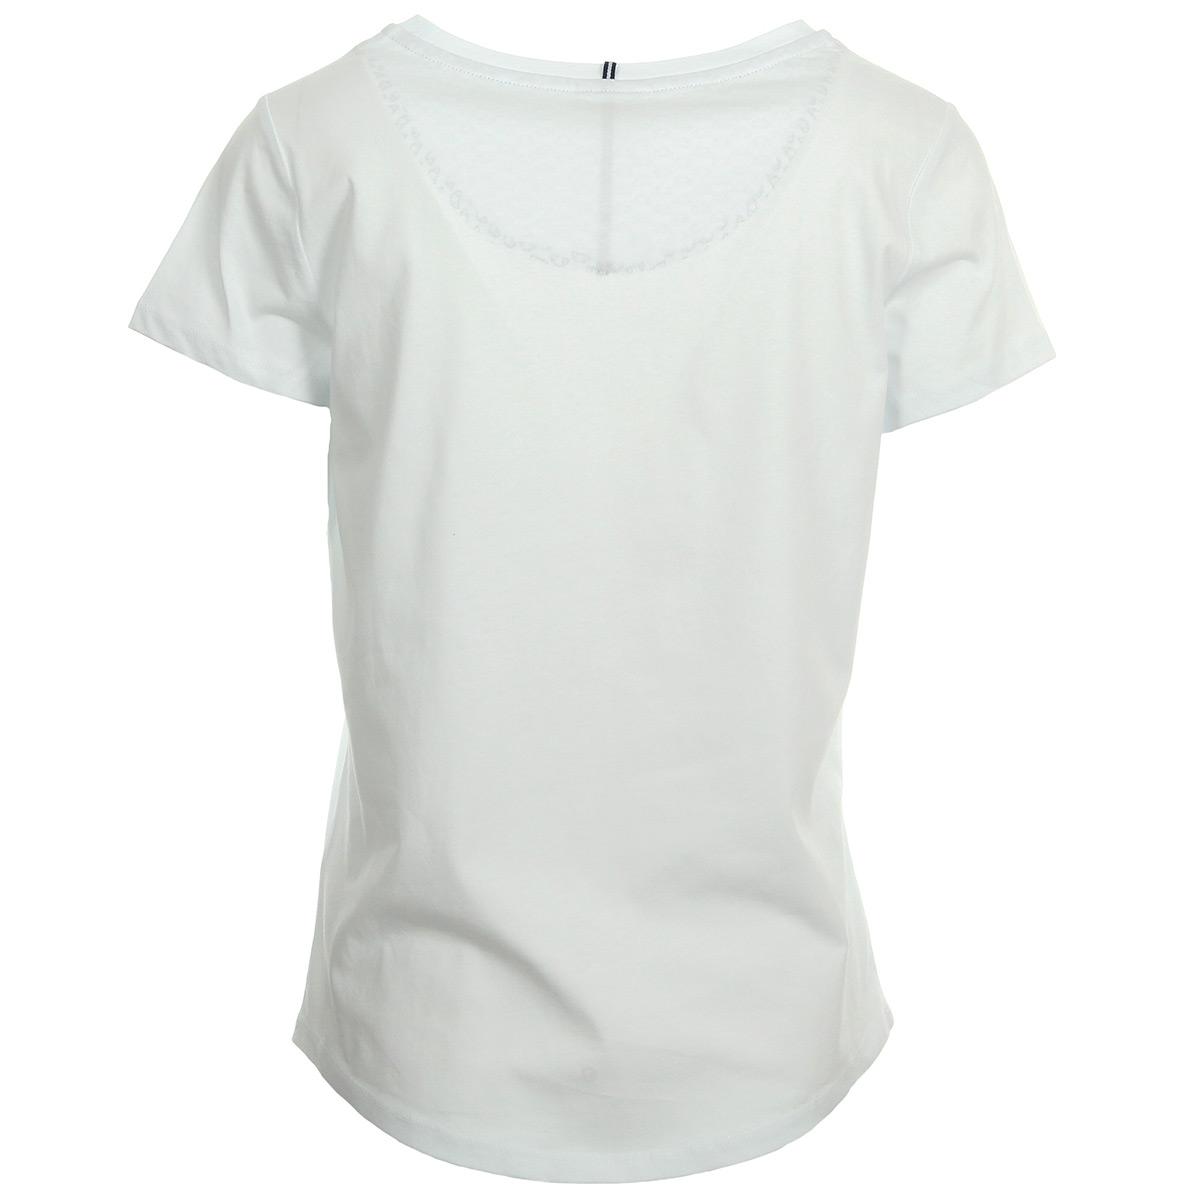 Ellesse Tee-Shirt Oversize Femme Col Rond Uni Blanc 1074NBLANC, T-Shirts femme